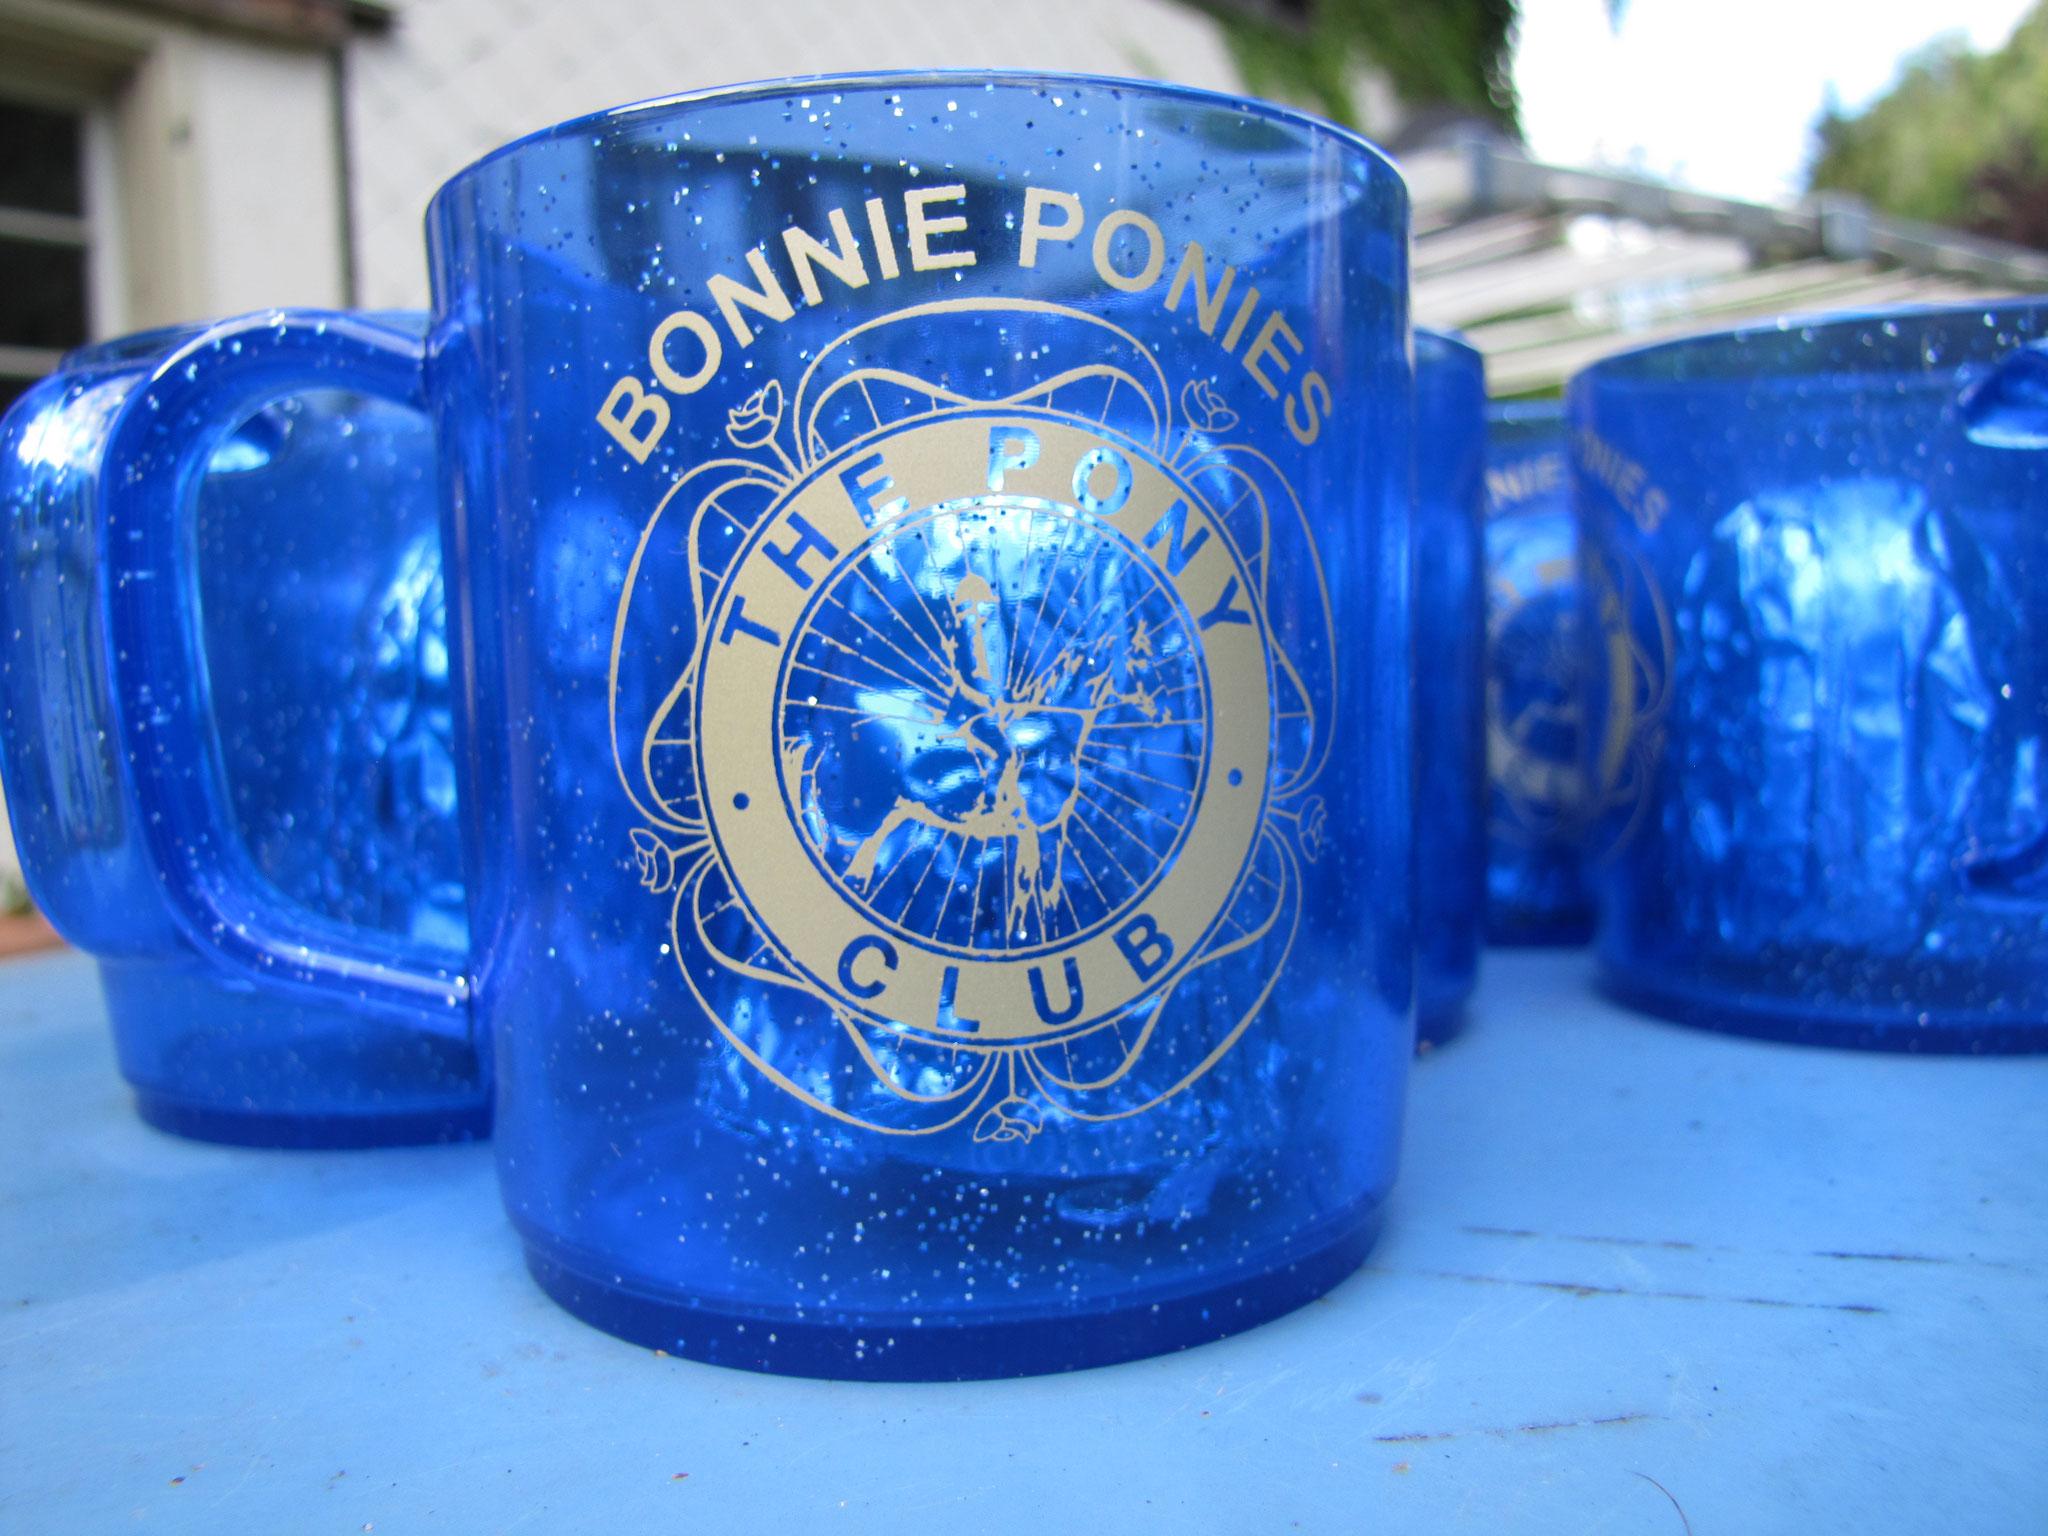 22.08.2020 Bonnie Ponies Trophy